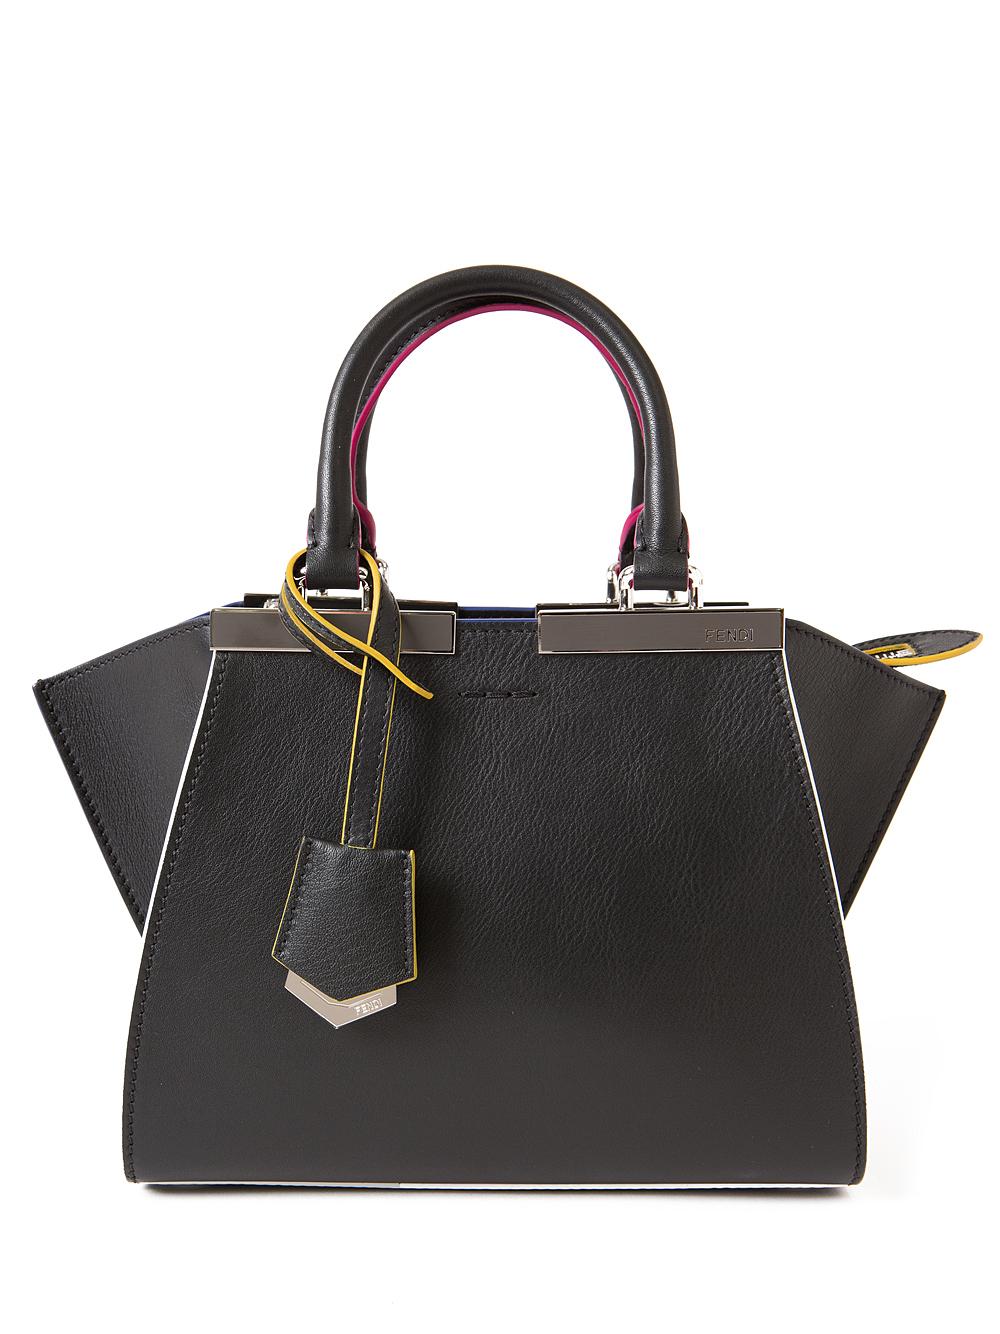 58002b33a8 ... czech lyst fendi 3 jour shopper bag in black e0d62 fc7bc ...